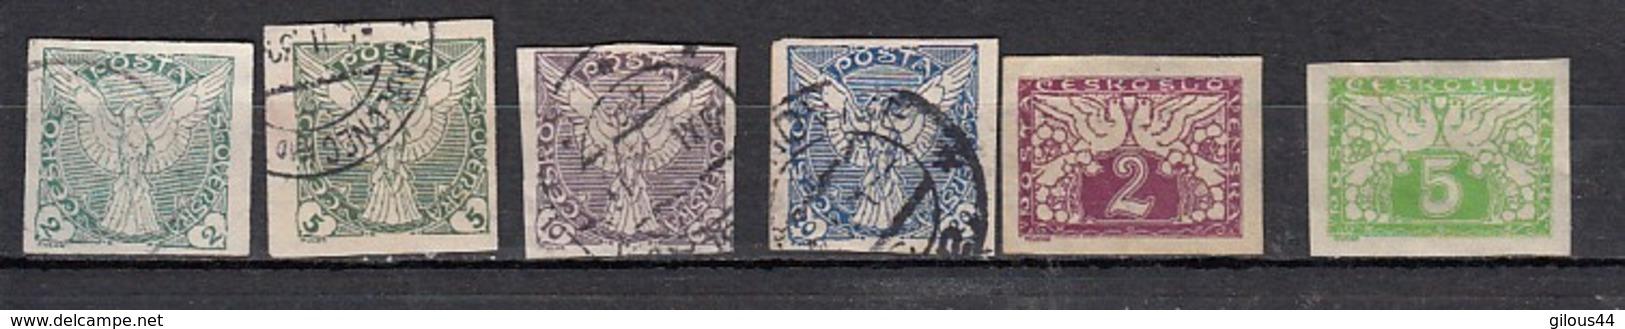 Tchecoslovaquie  Timbre Pour Journaux 6 Valeurs - Newspaper Stamps